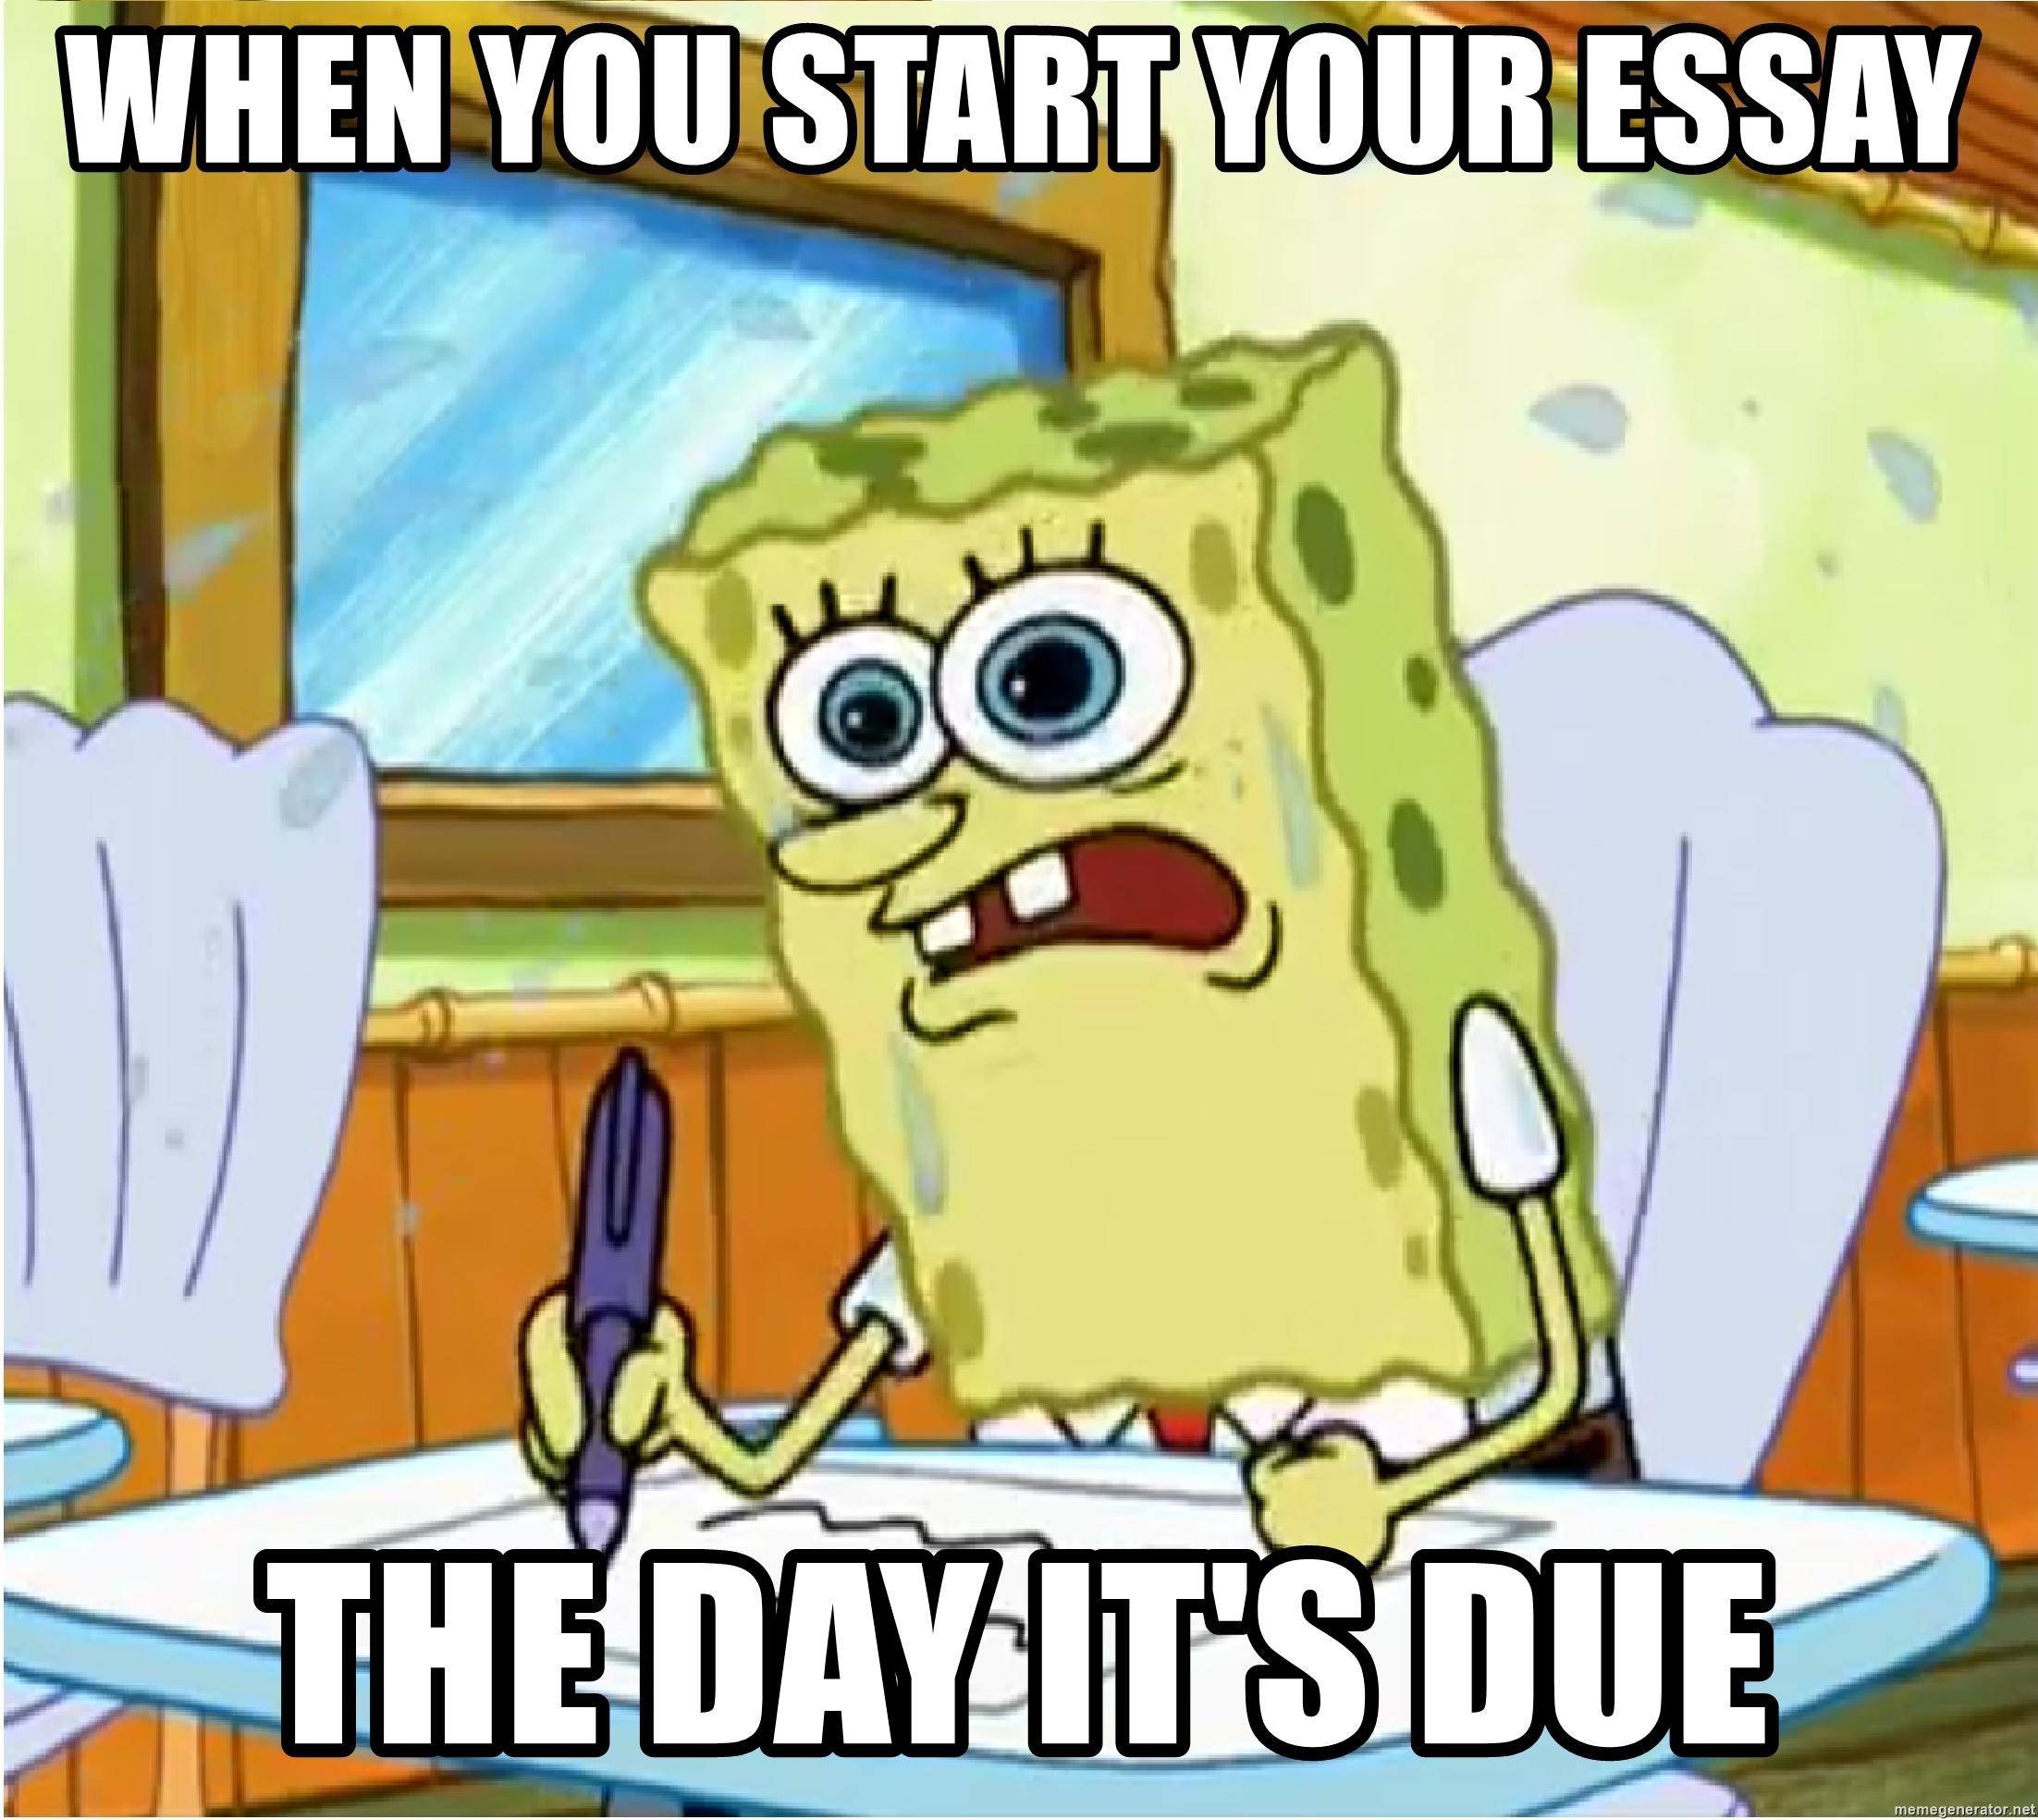 021 Spongebob Essay The Unforgettable Font Copy And Paste Gif Meme Full